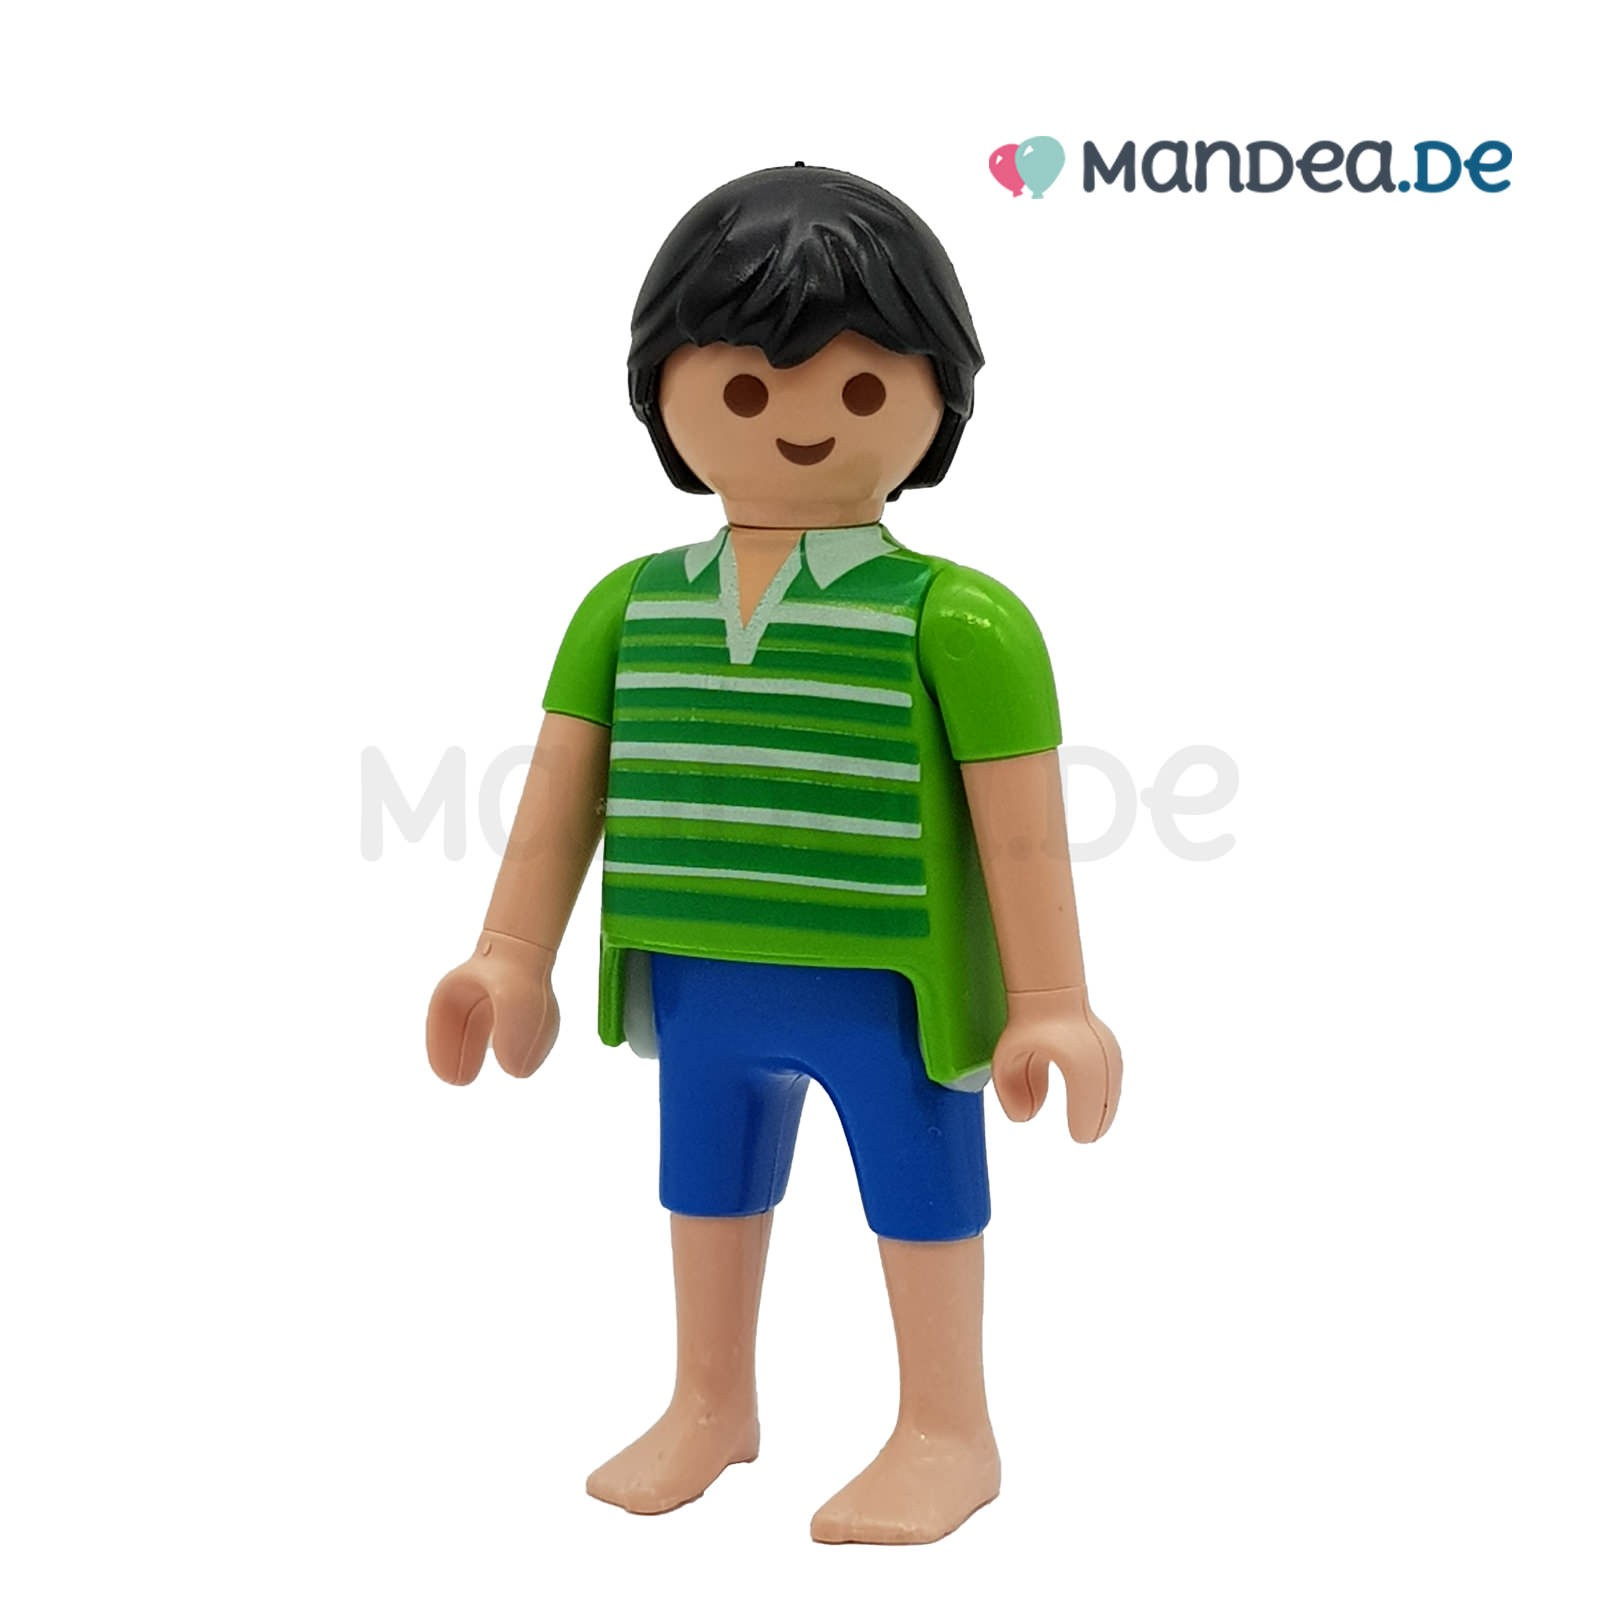 Playmobilfigur